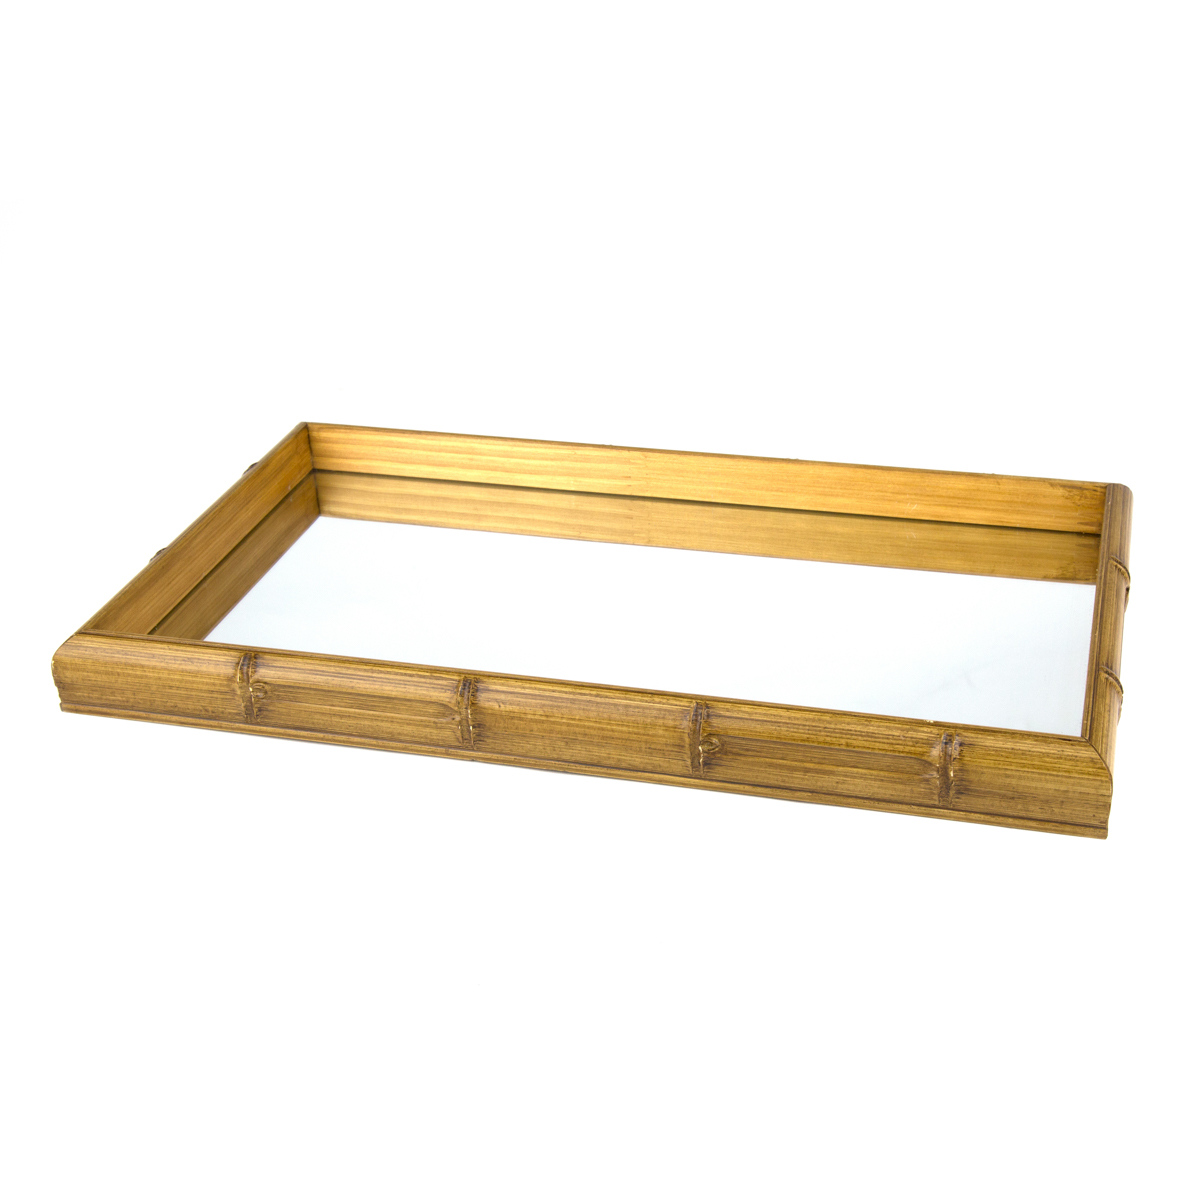 Bandeja Bambu com Espelho 46x26x4cm - Woodart